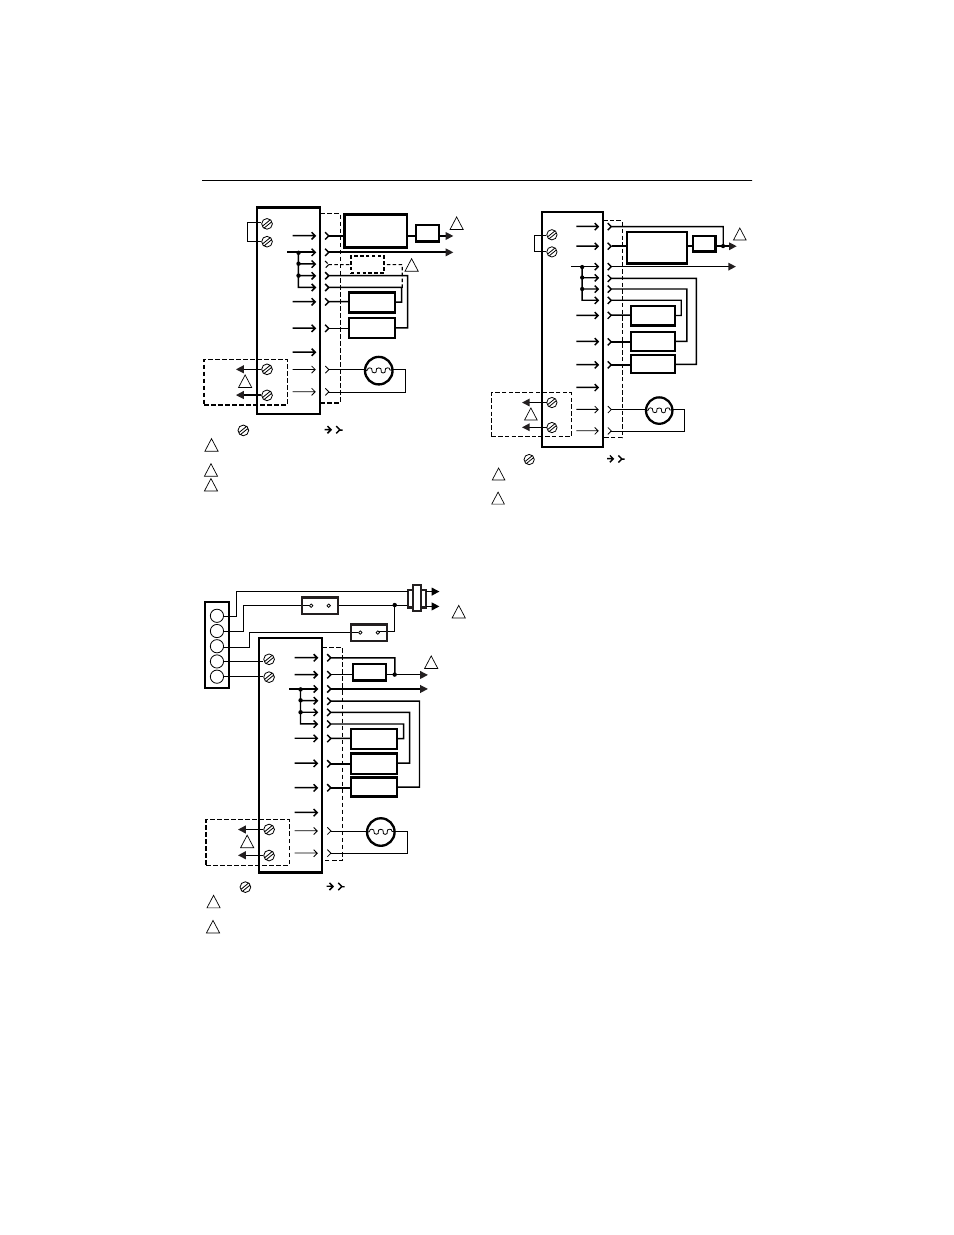 Beckett R7184B Wiring Diagram from www.manualsdir.com